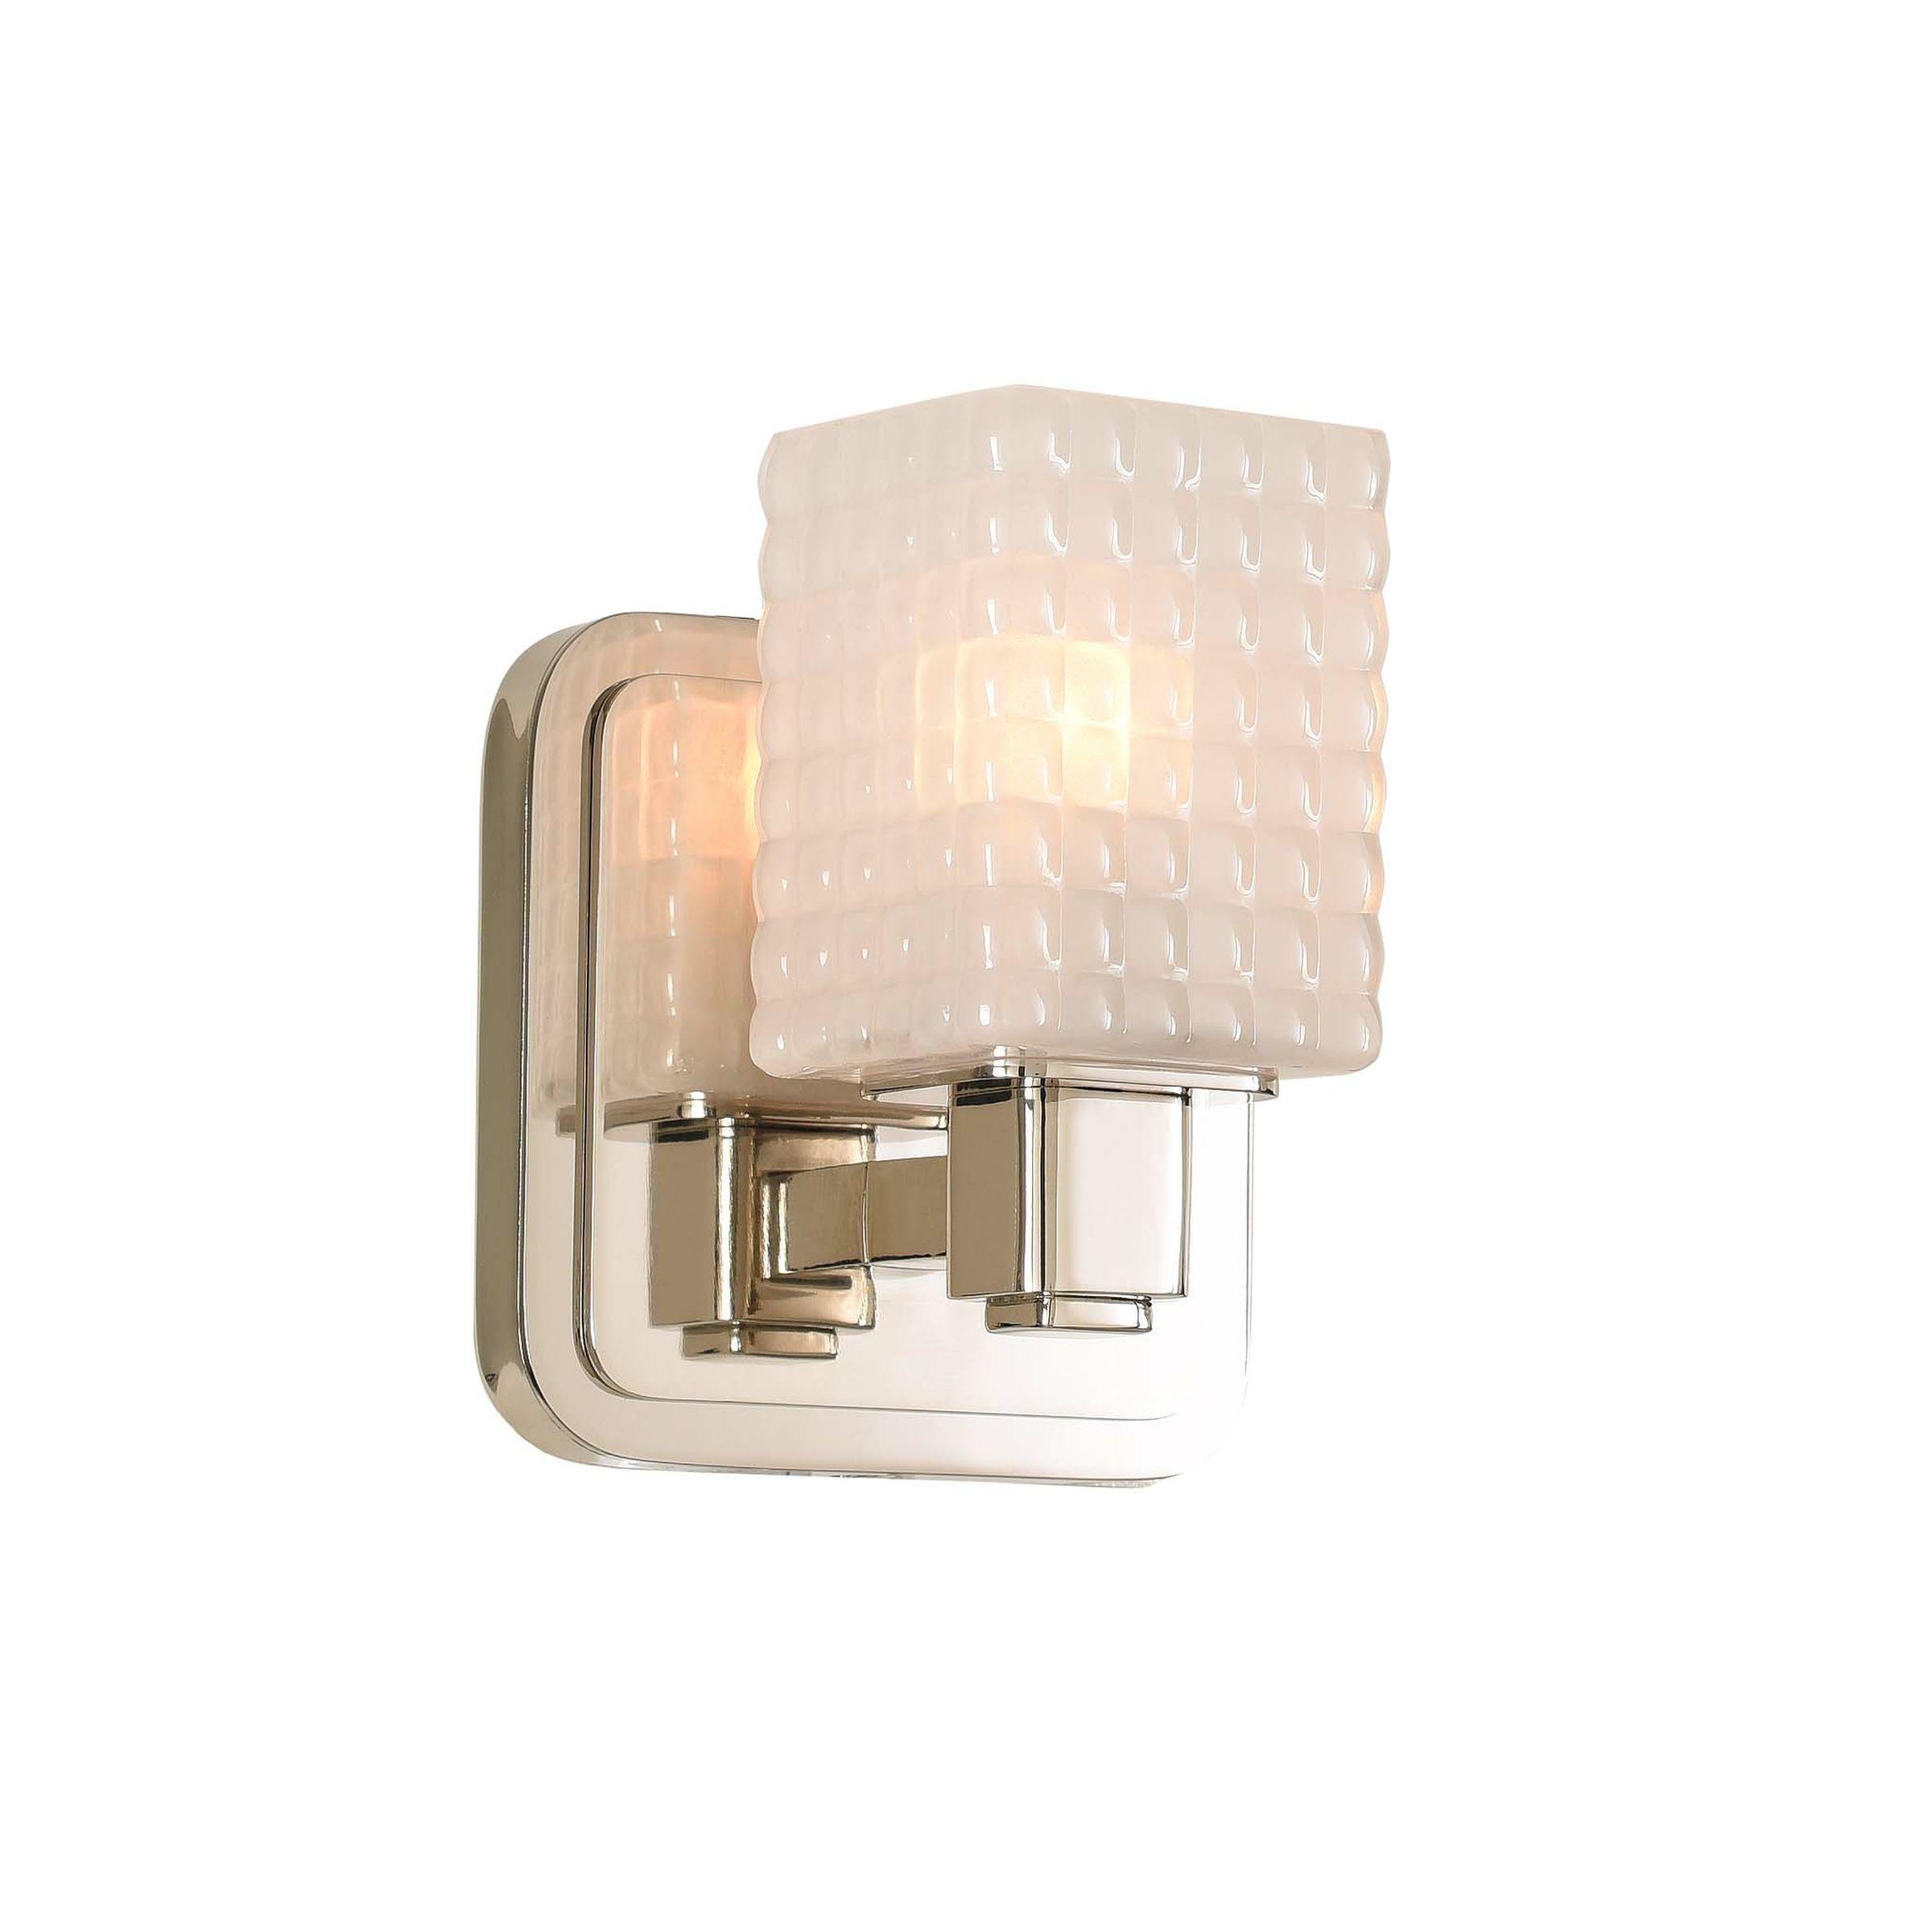 Avanti Bathroom Vanity Light By Kalco